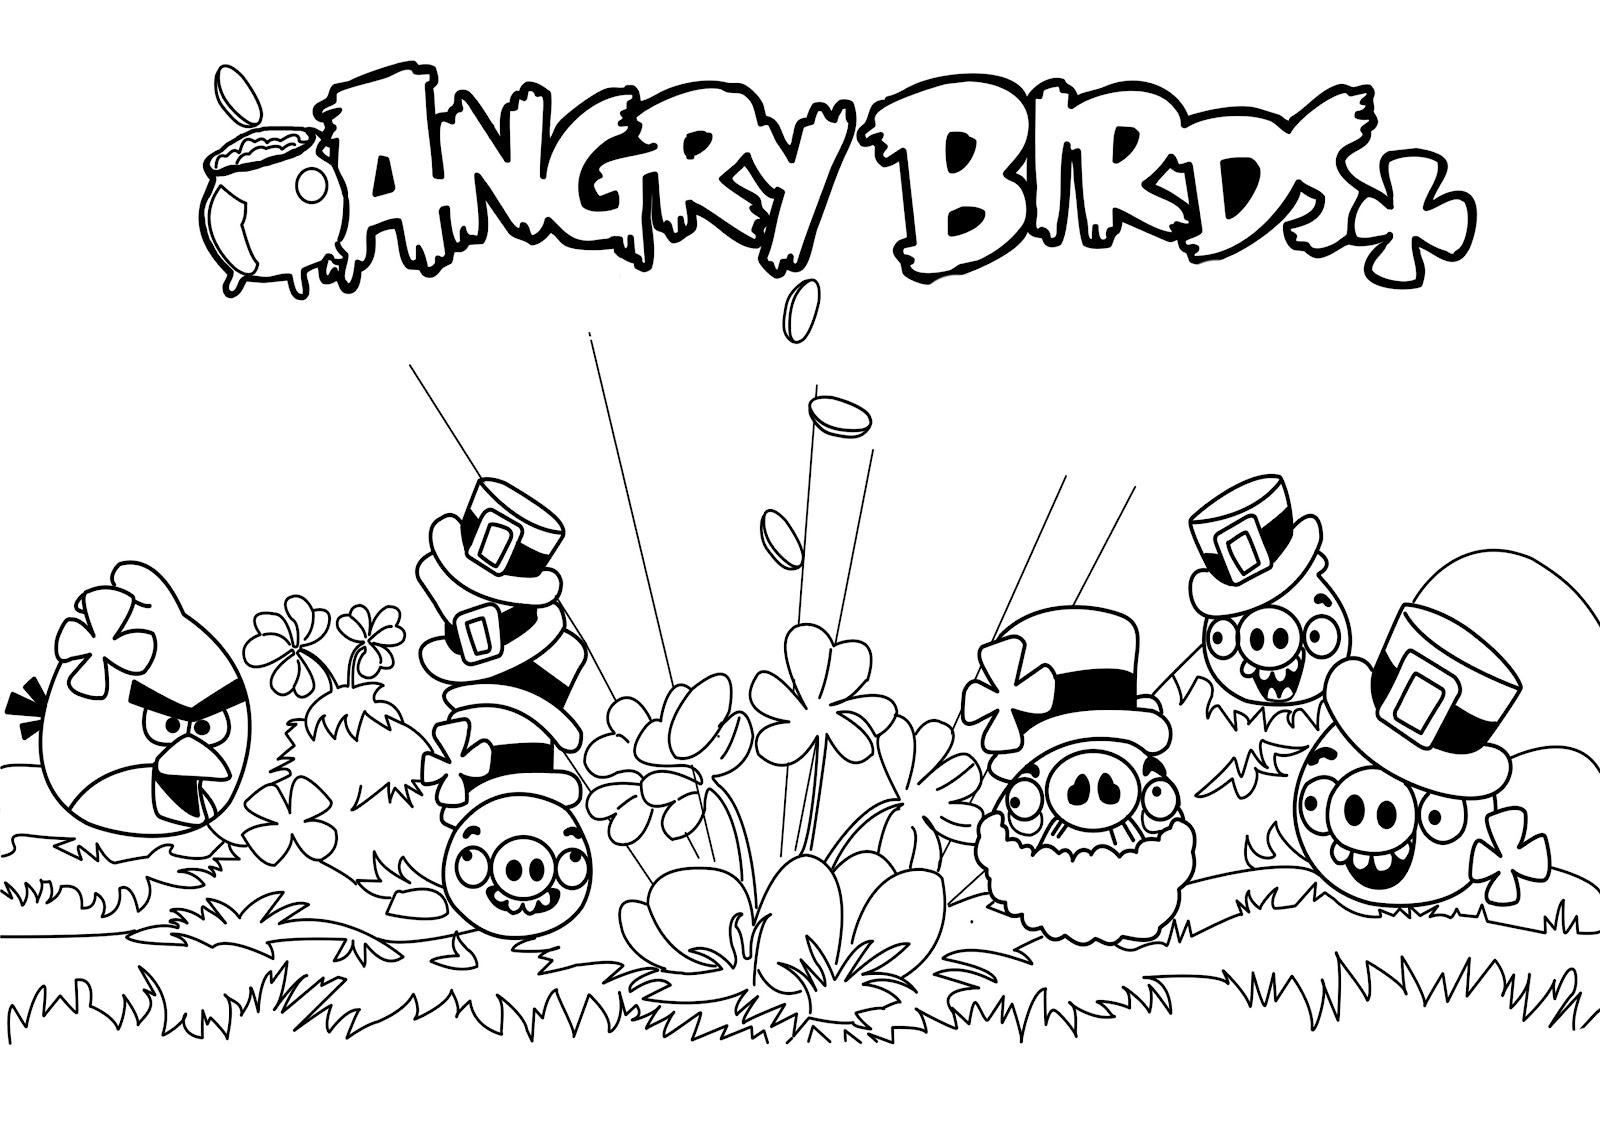 Colorea tus dibujos dibujo de angry birds celebrando el for Angry birds rio coloring pages